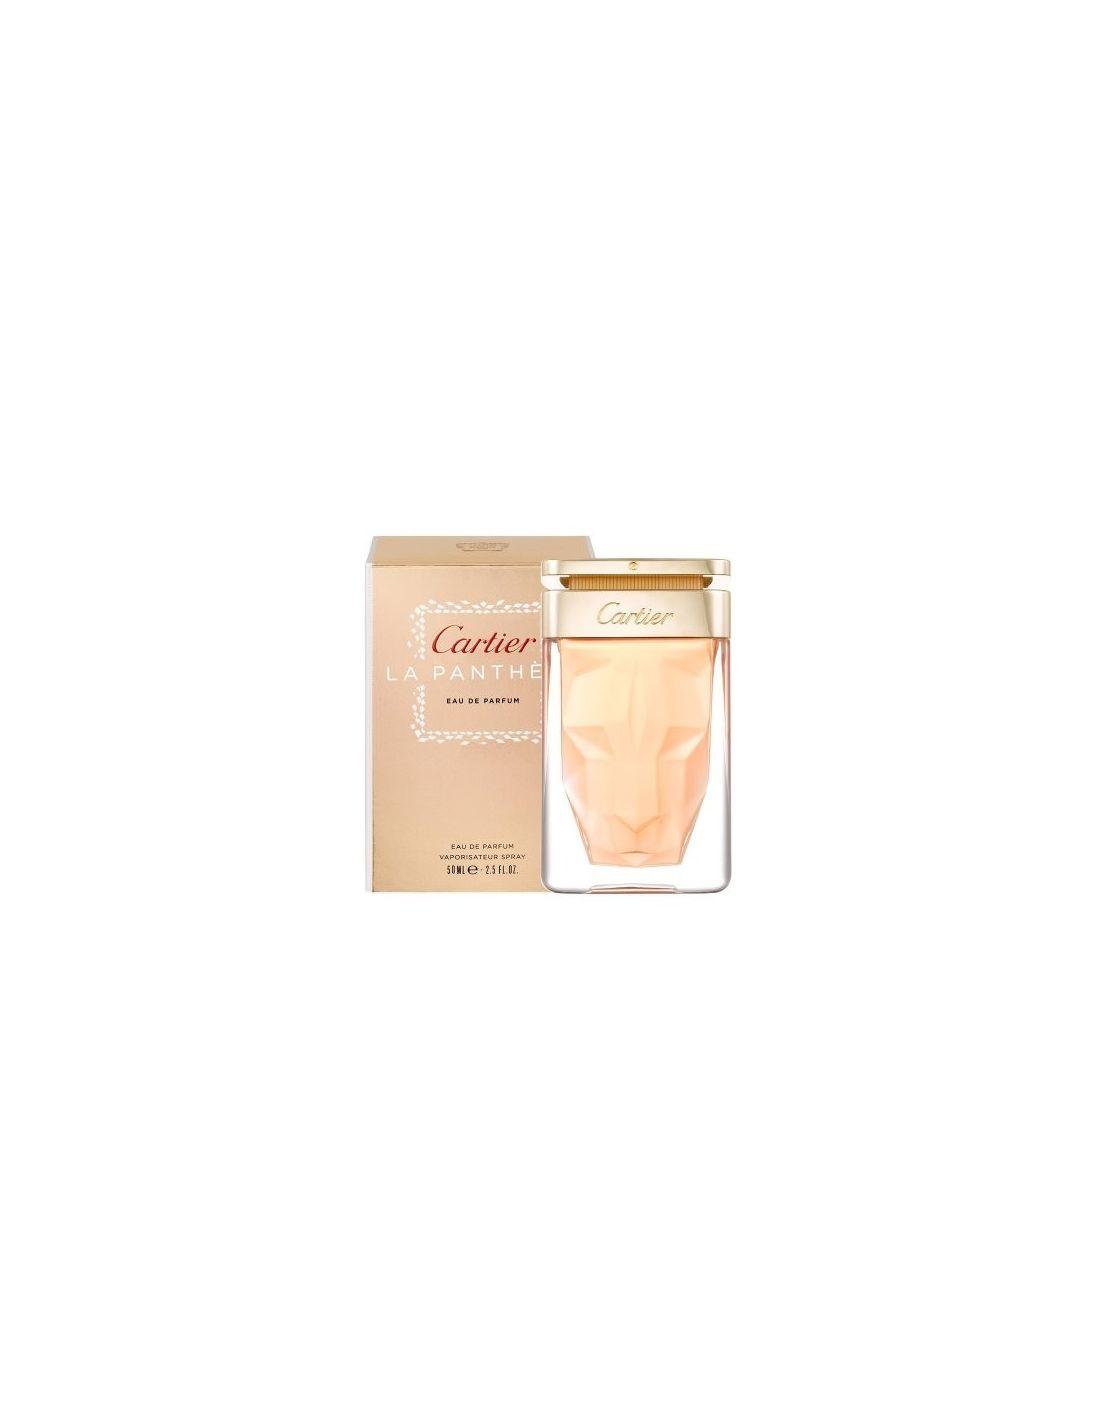 d3935530b20 PerfumeLa Panthére Eau de Parfum 50 ml - Perfumes 24 ®